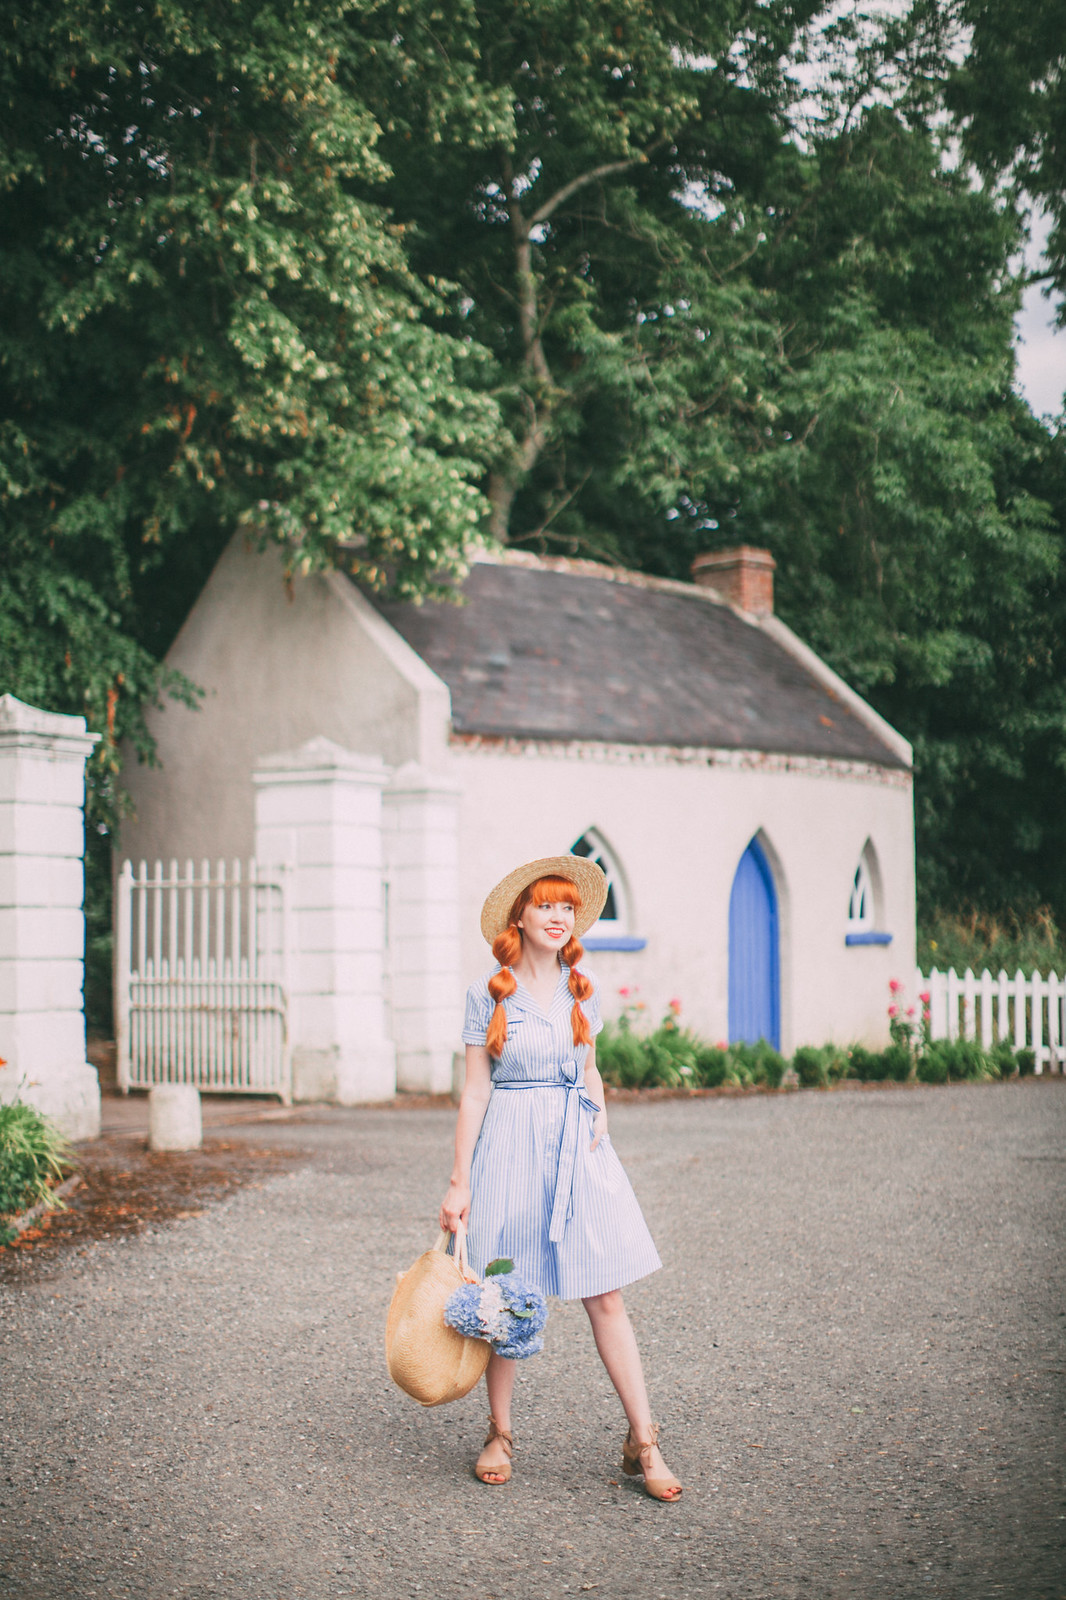 summerisland gatehouses-17